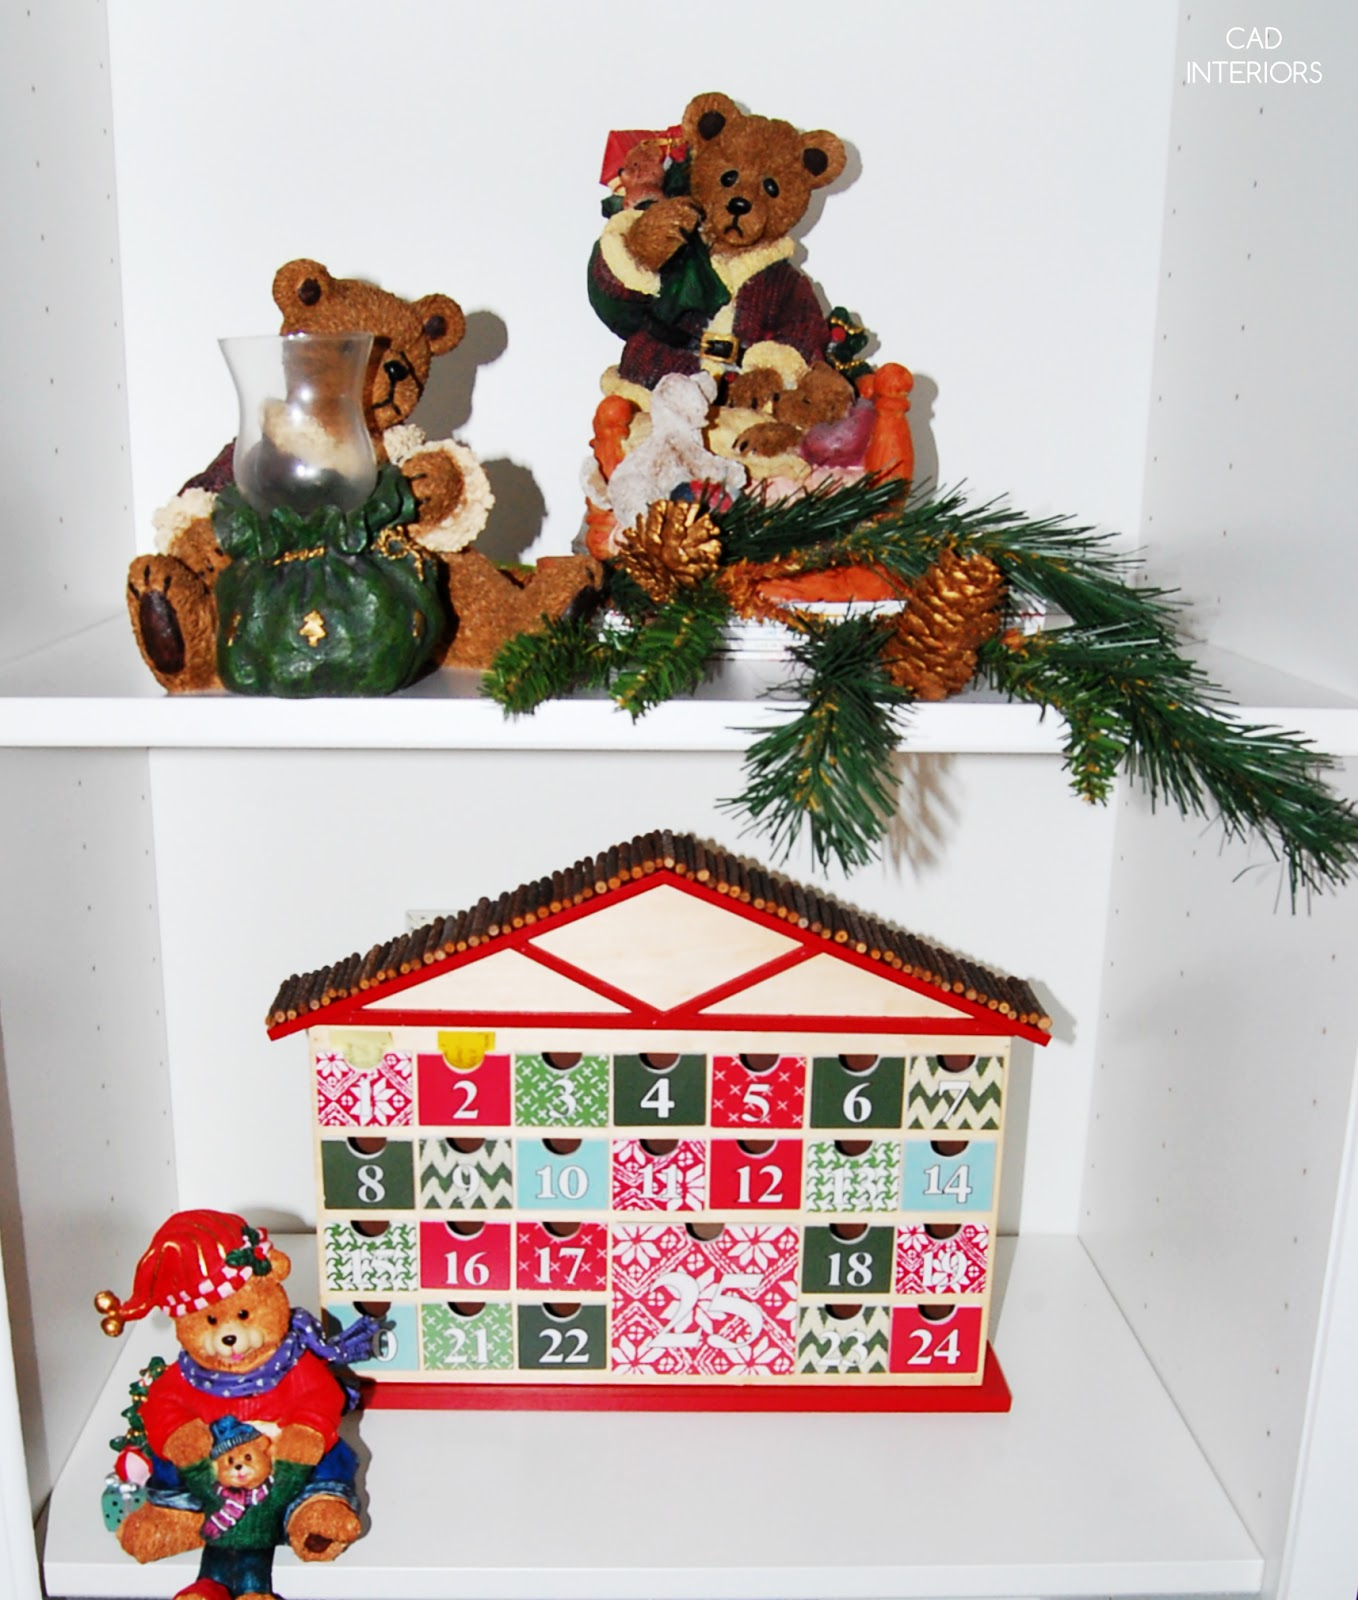 Christmas holiday traditions customs decor